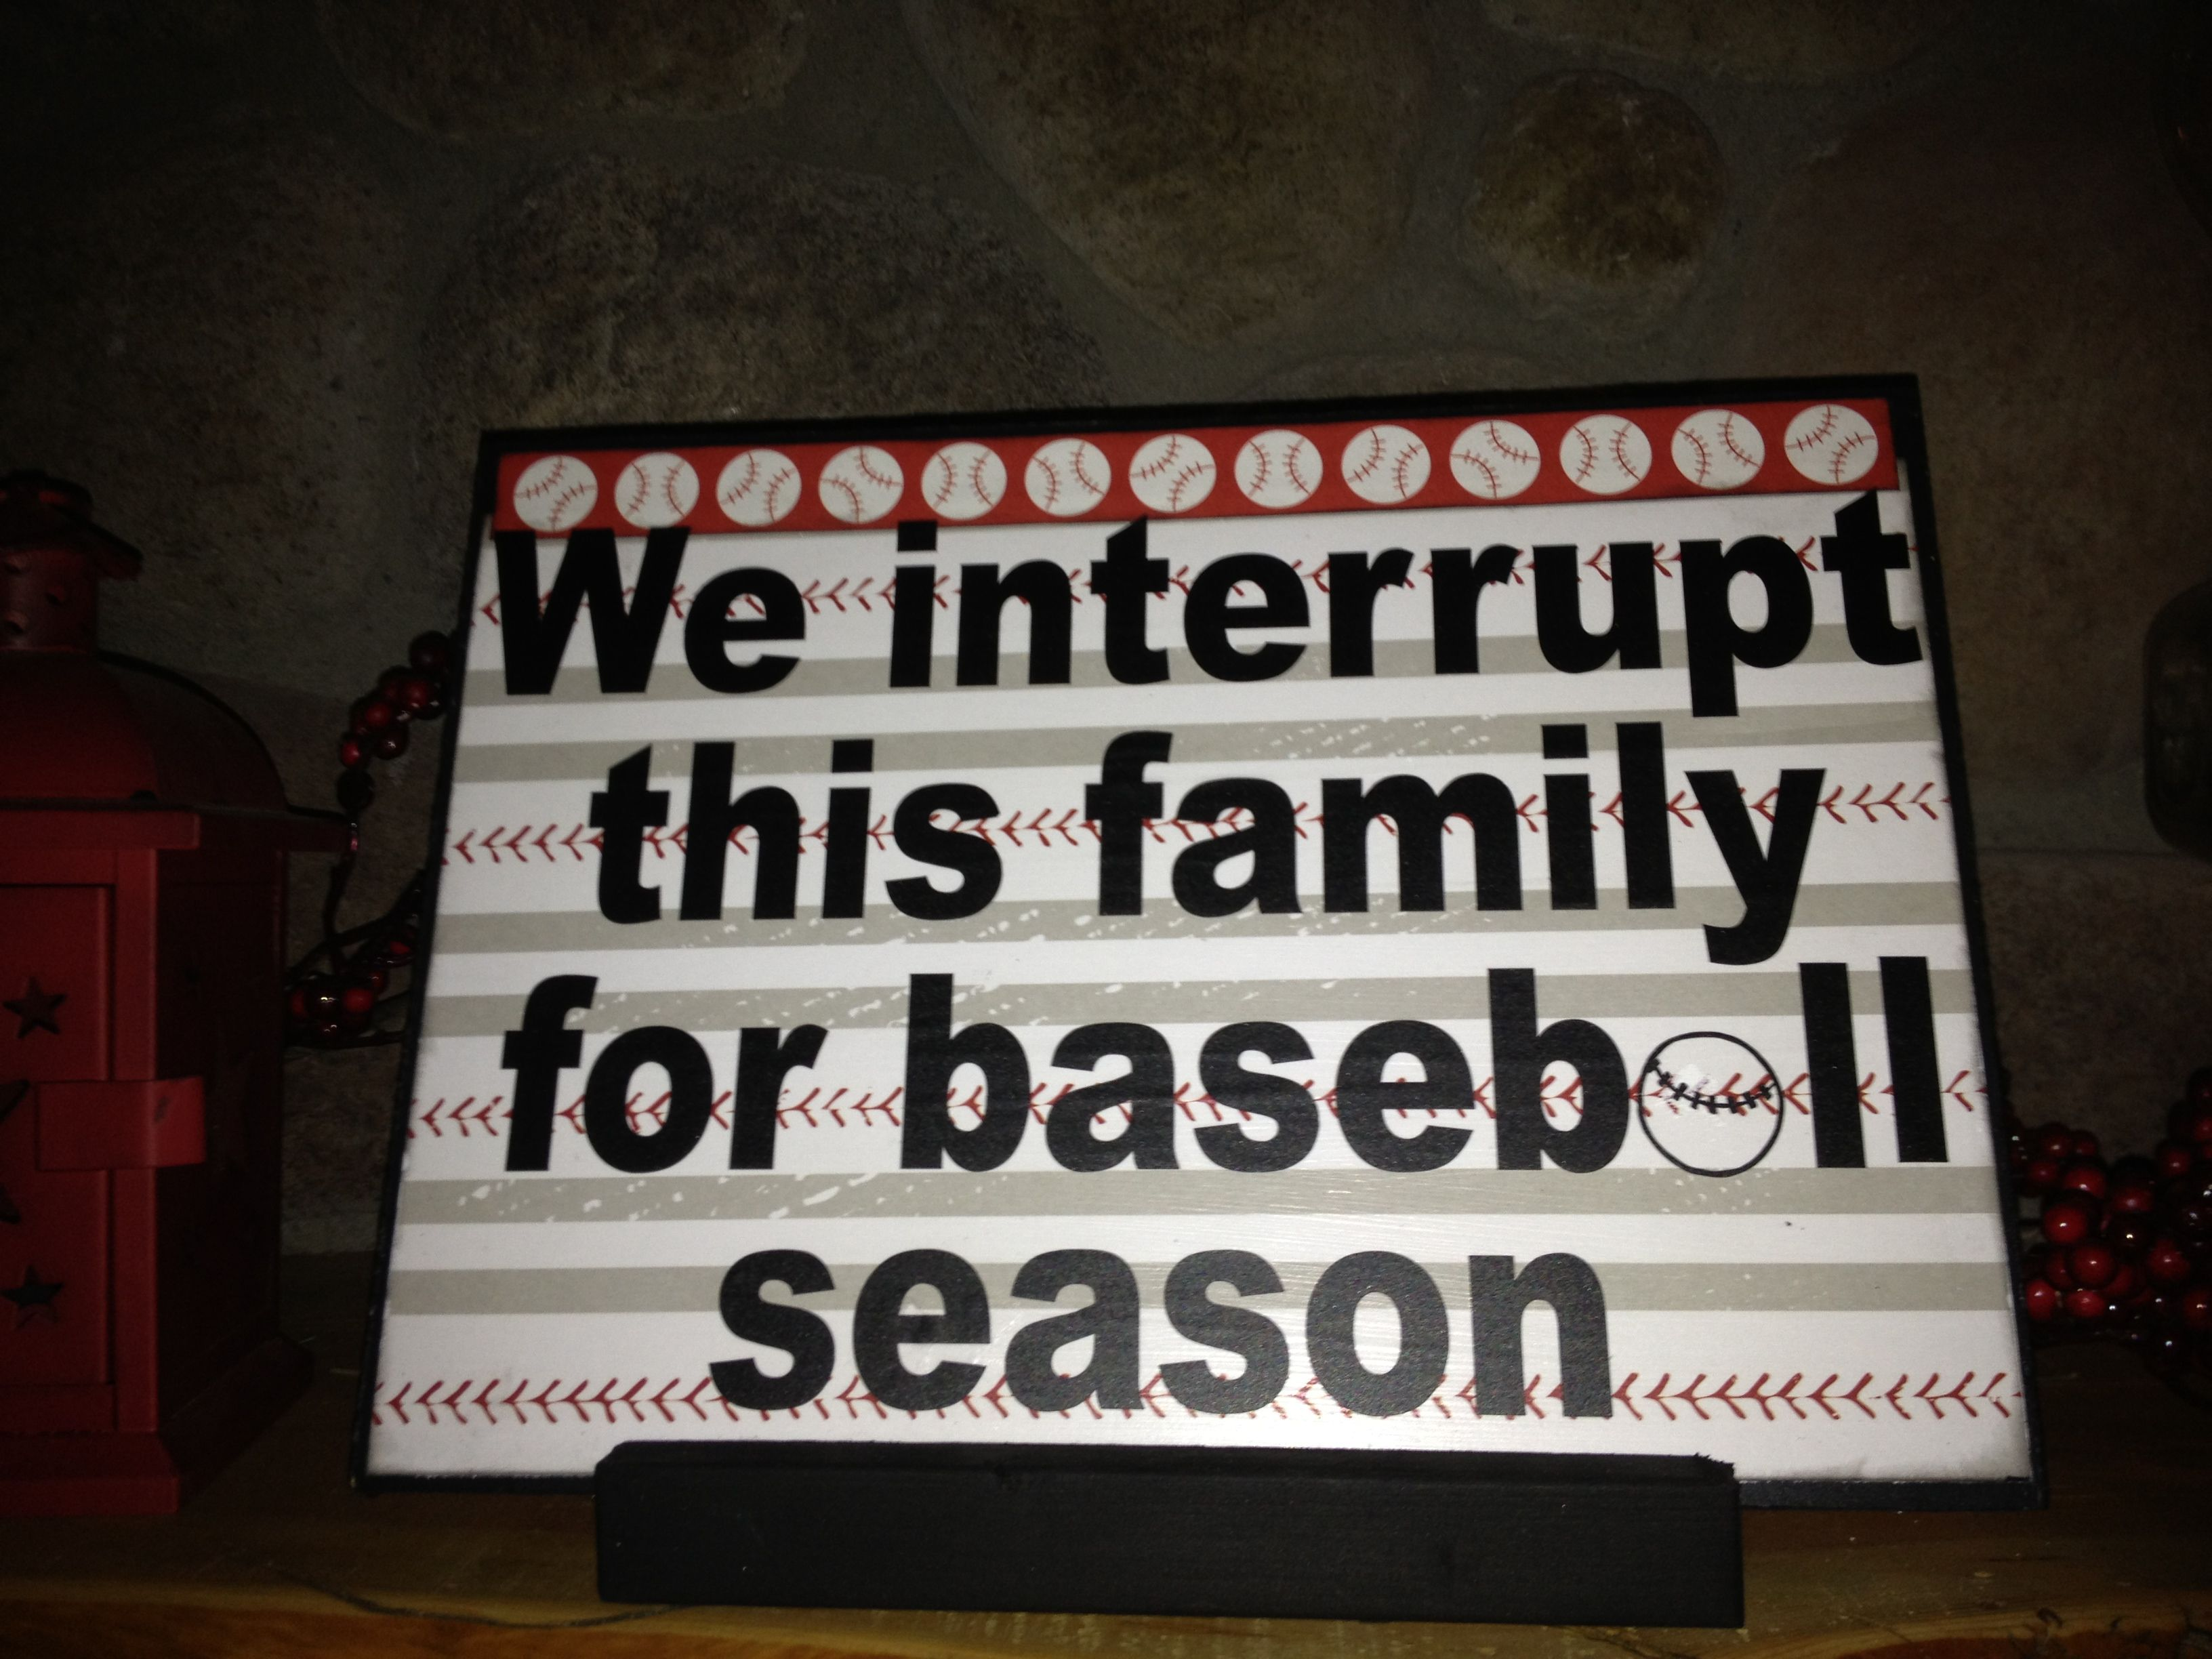 We interrupt this family for BASEBALL season sign wood custom